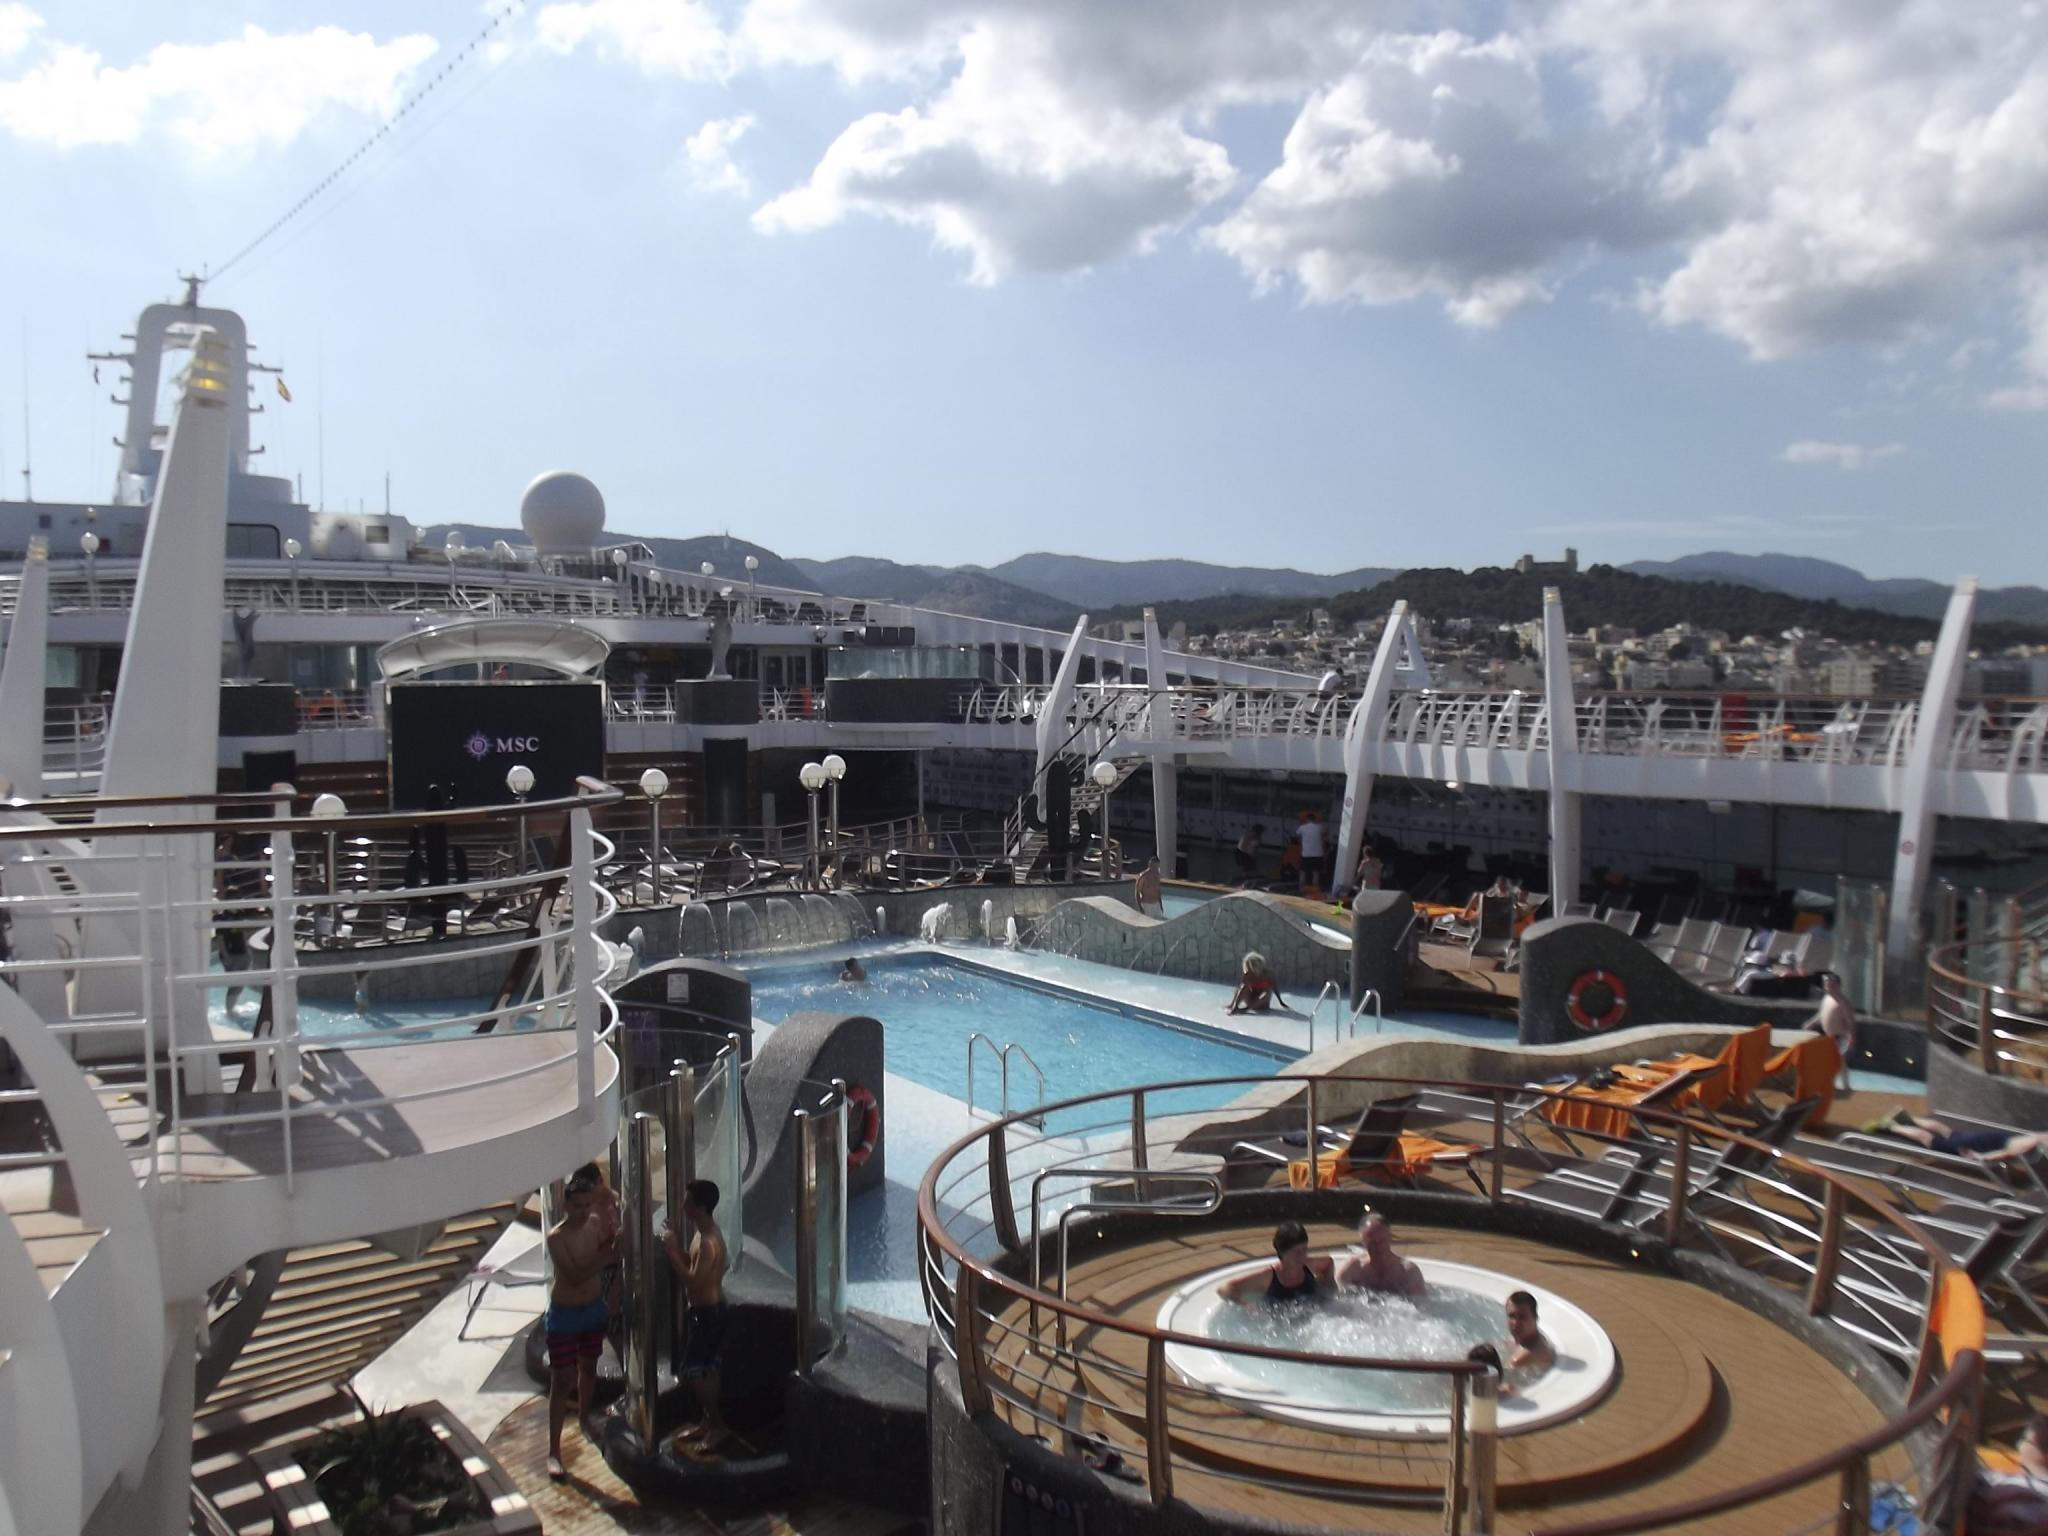 PALMA. CRUCEROS. El crucero ' MSC Divina ' inauguró ayer sus visitas a Palma